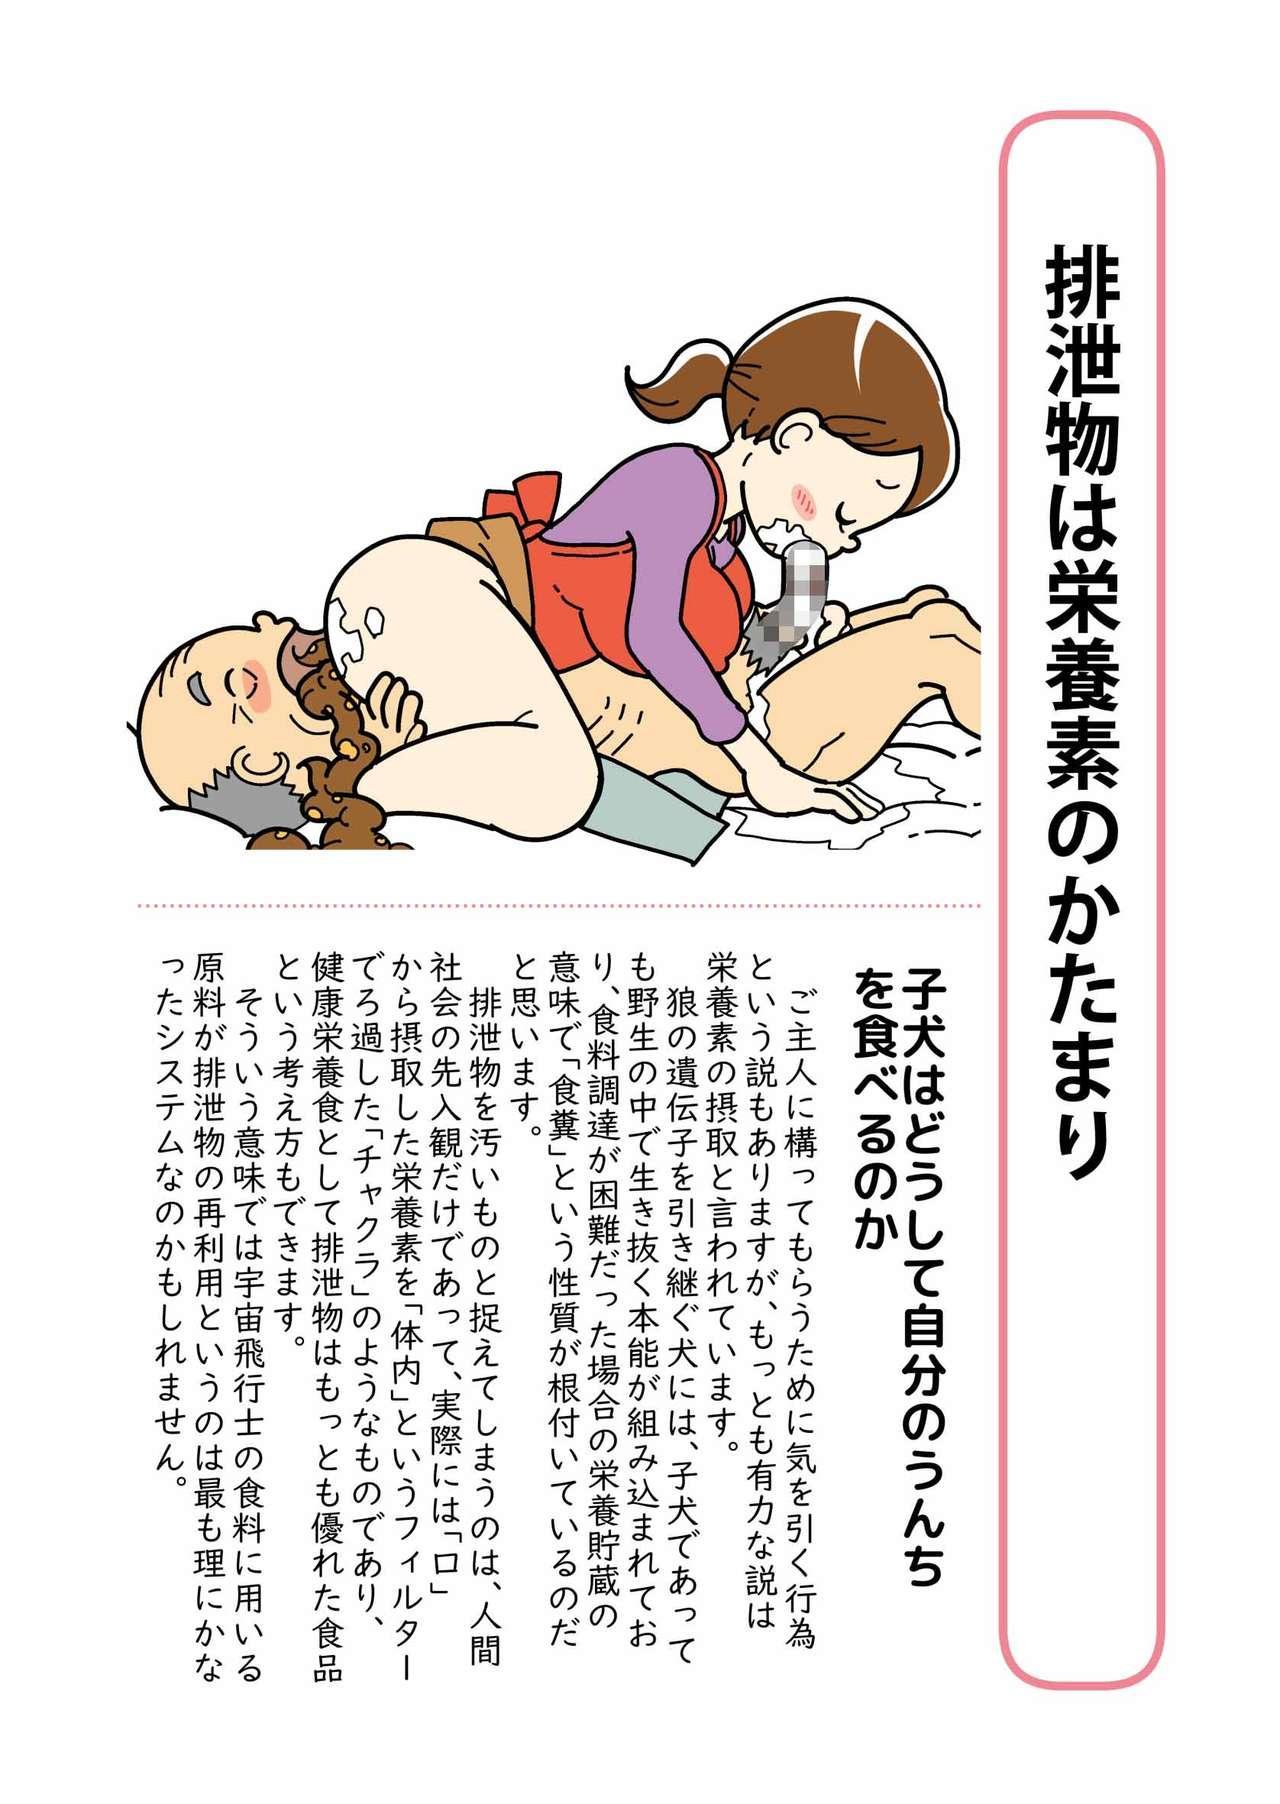 Isogasii Okaasan No Tamuno Sasa Rouzin Seikaigo | Guide for Elderly Sex Health Care to Busy Mom 33